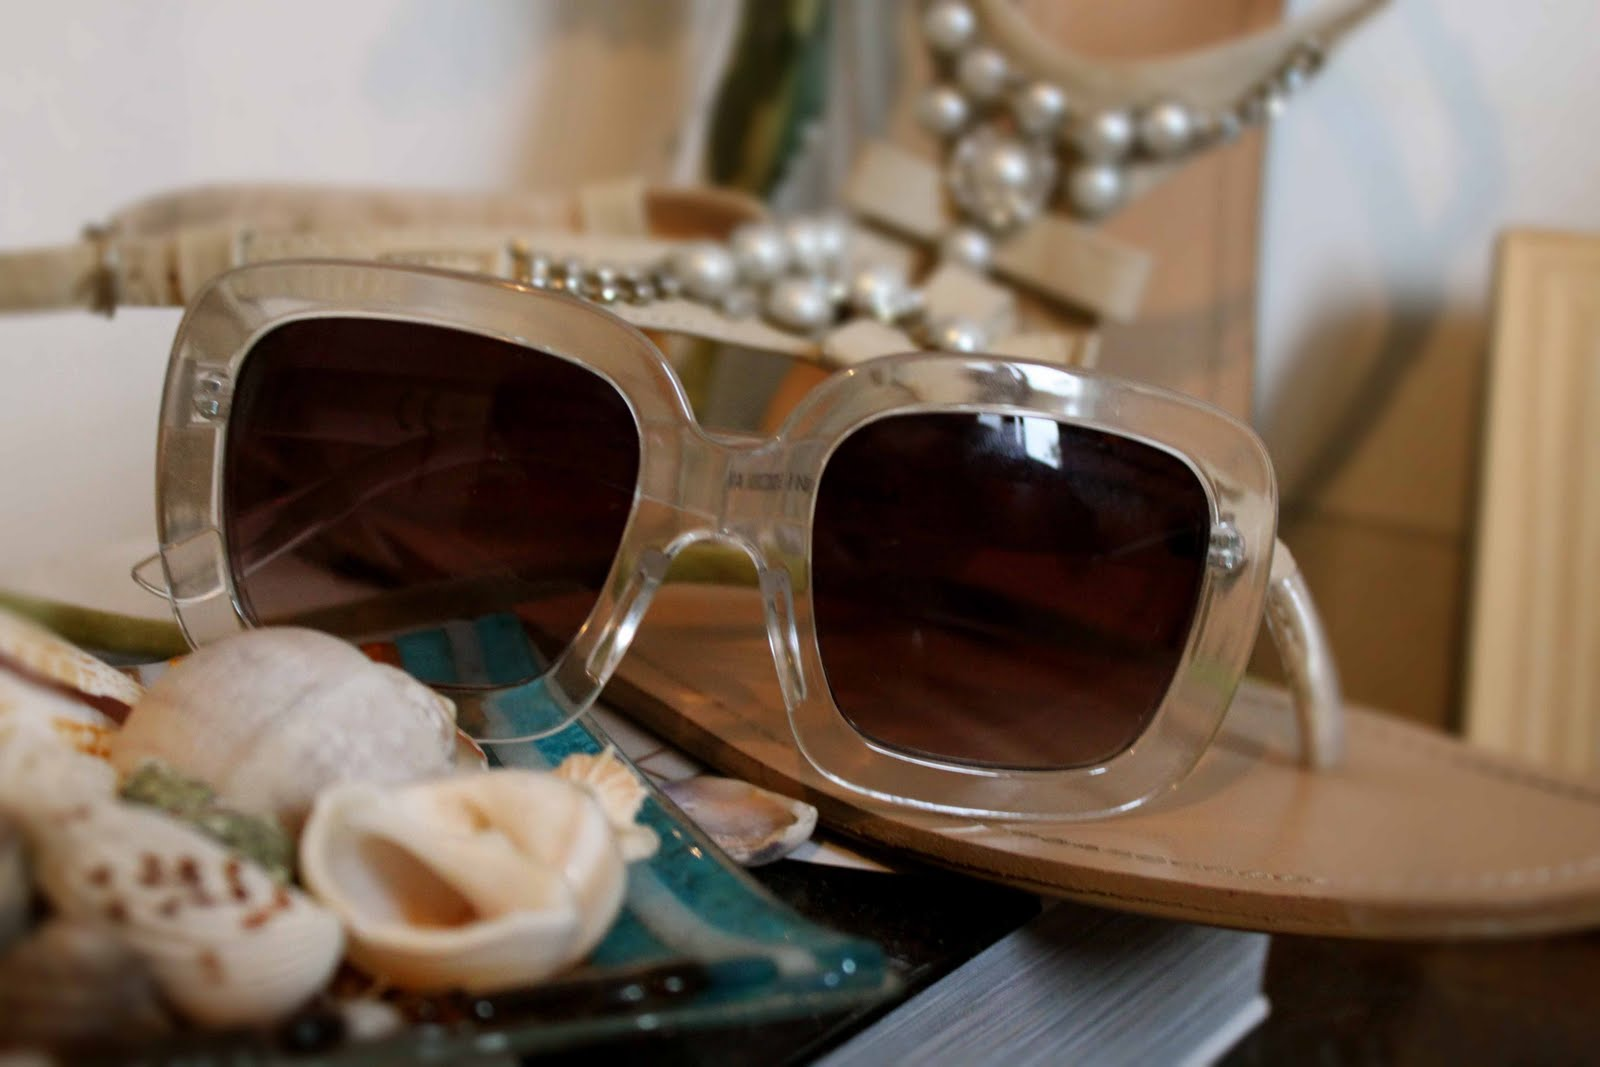 Summer Item #1: The Sunglasses